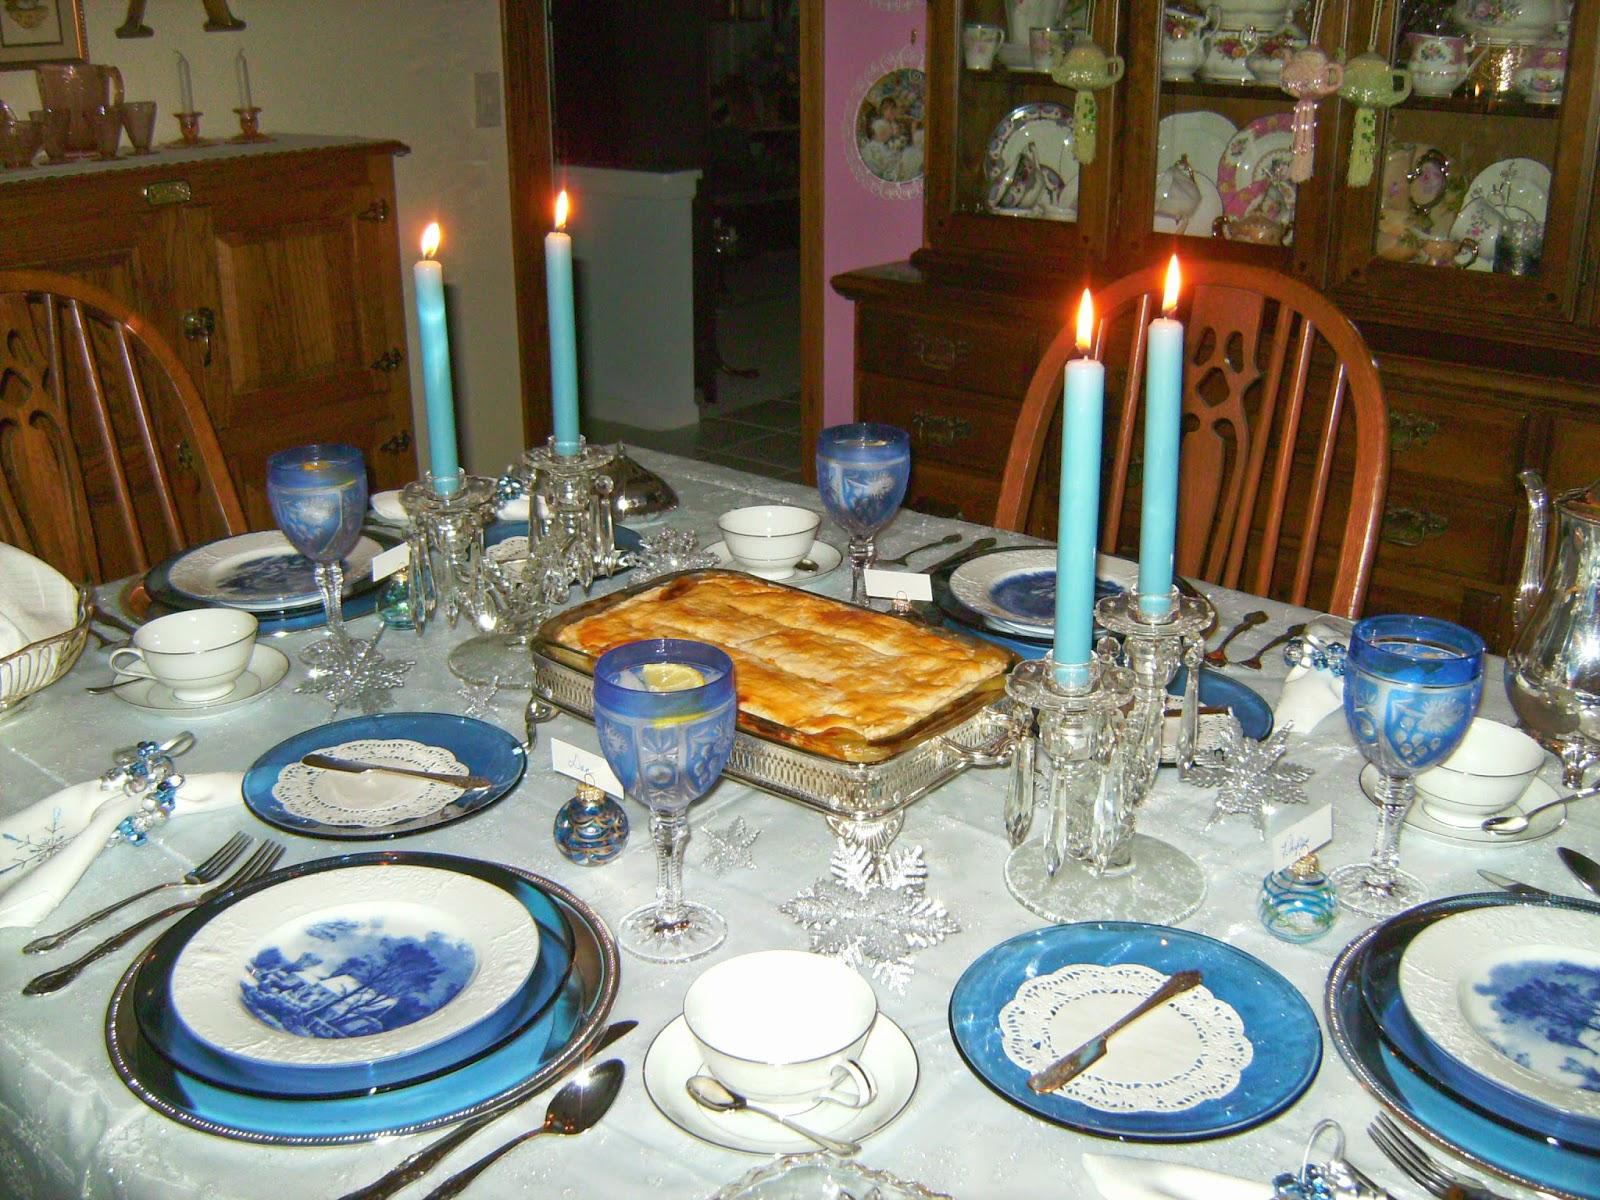 Temple Stuart Dining Room Set Relevant Tea Leaf Third Blog Anniversary Part Iv Home